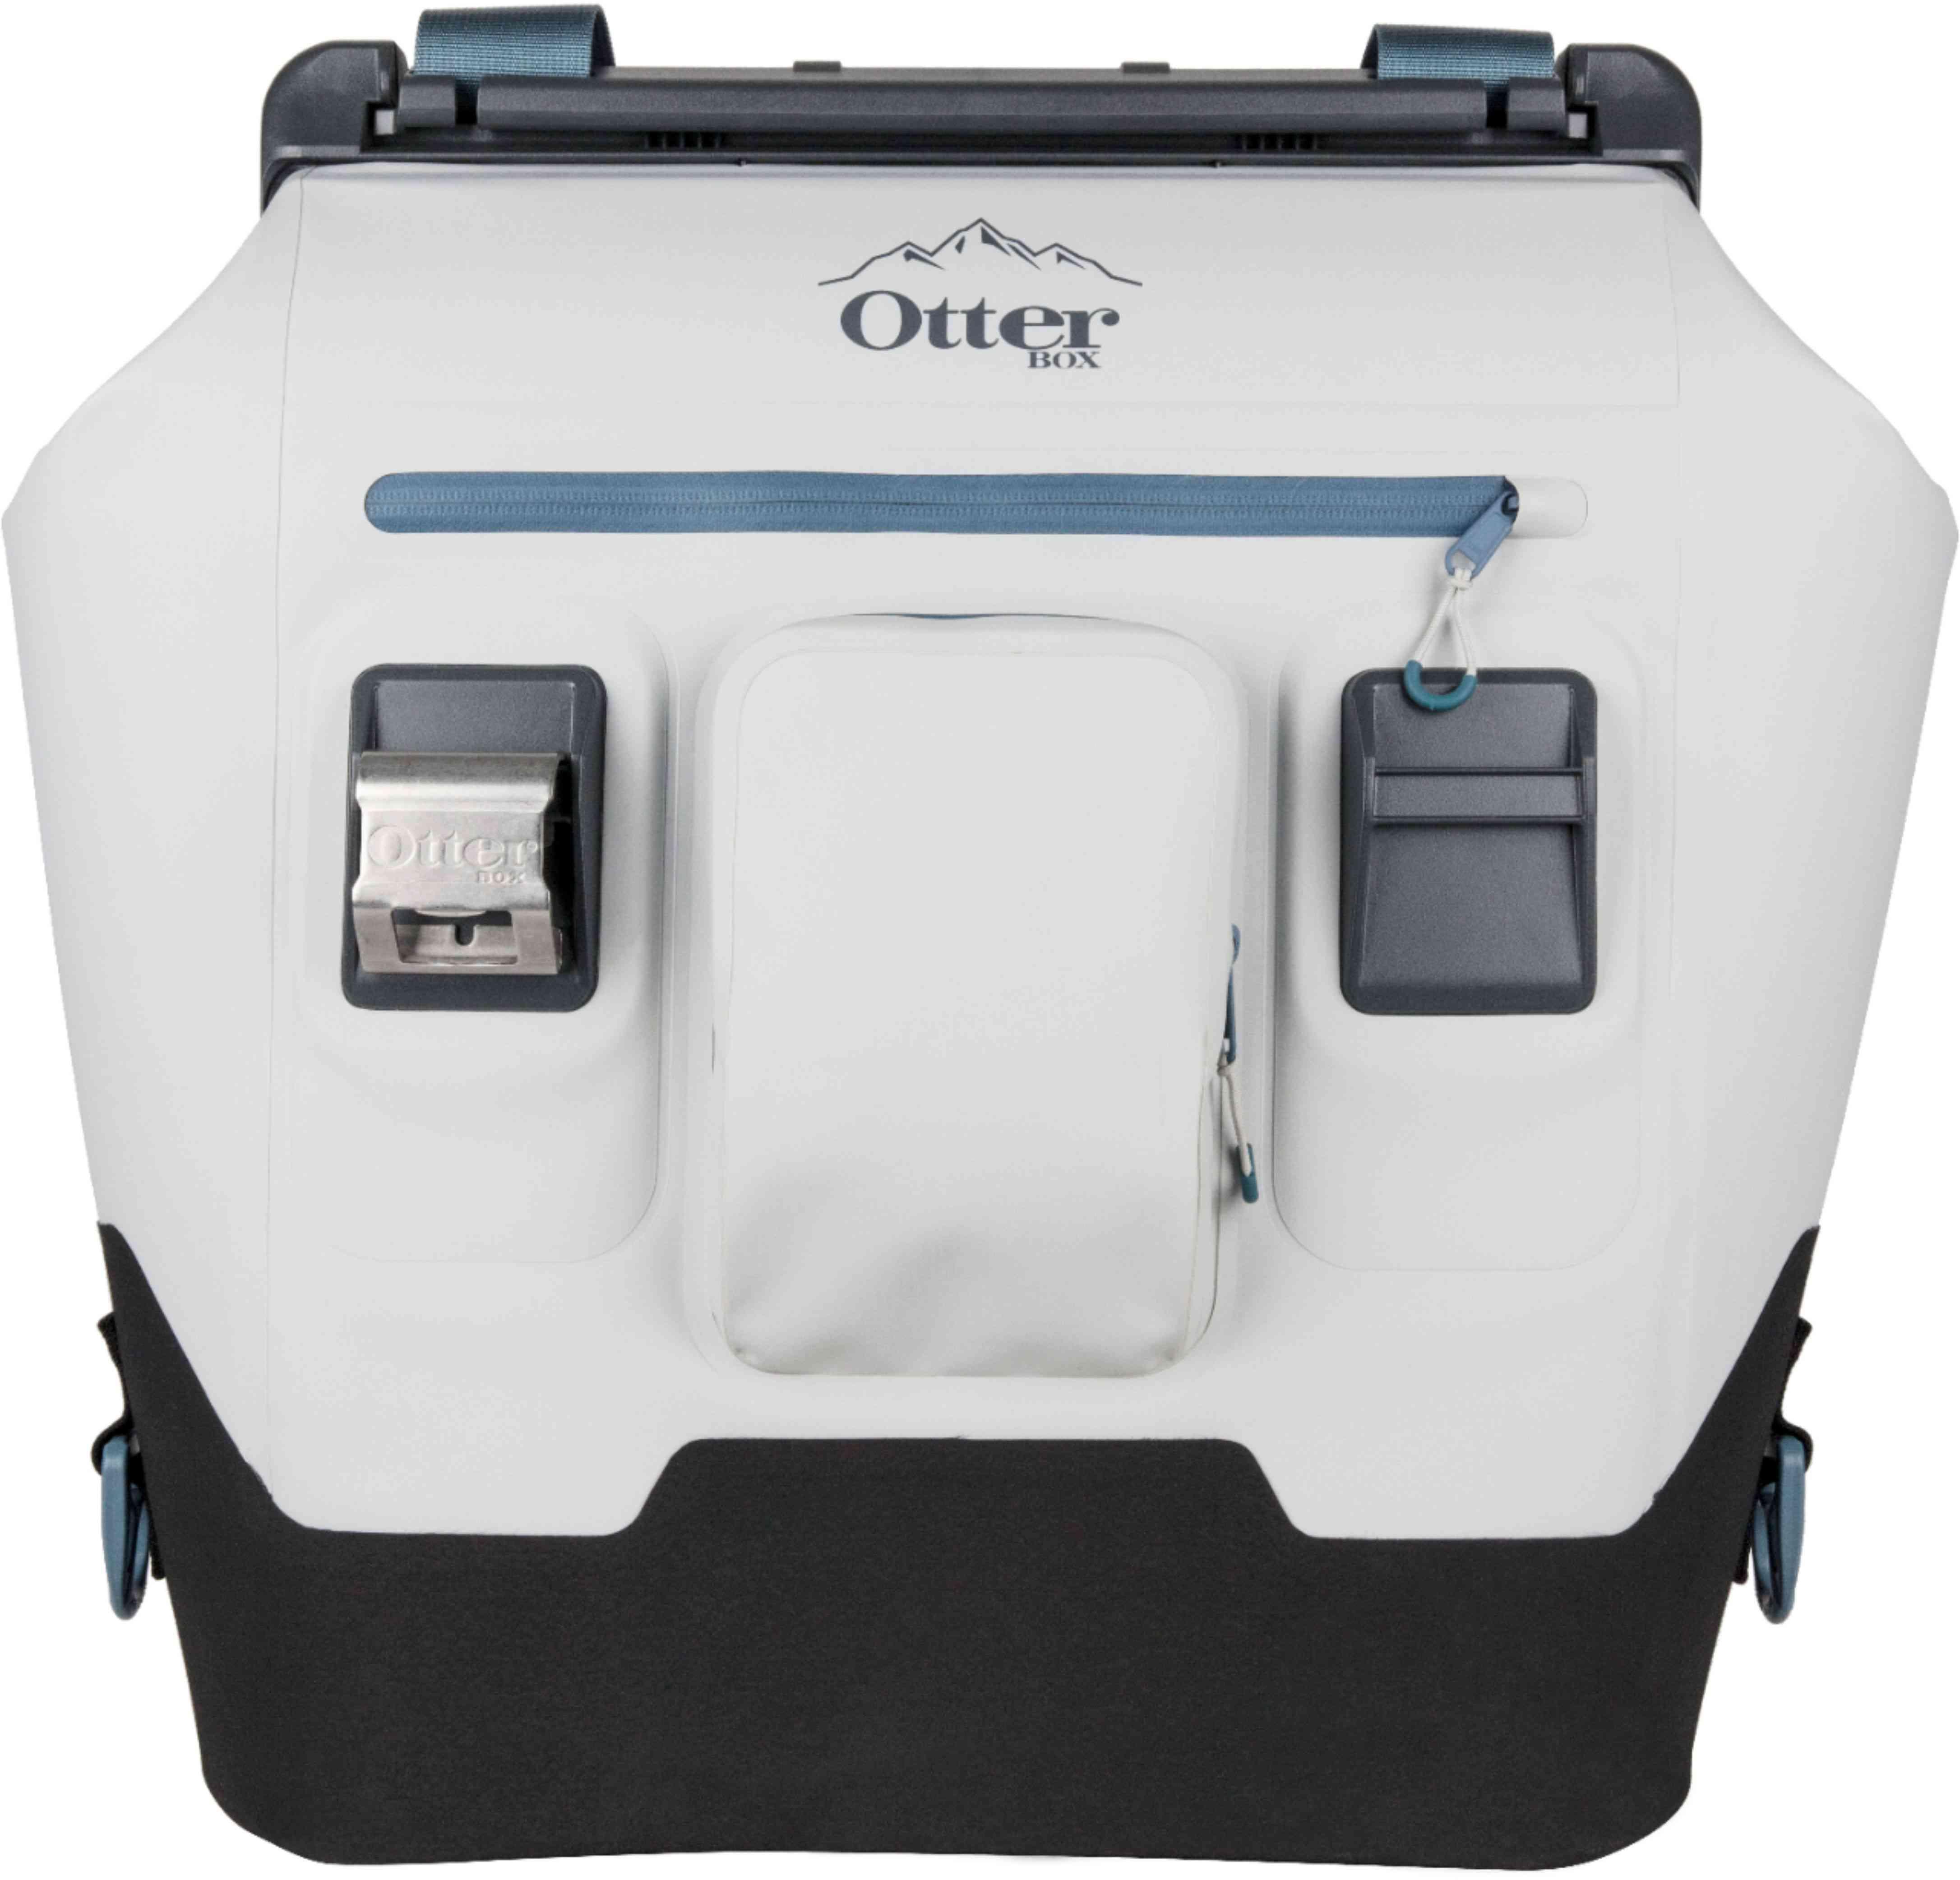 OtterBox Trooper Cooler